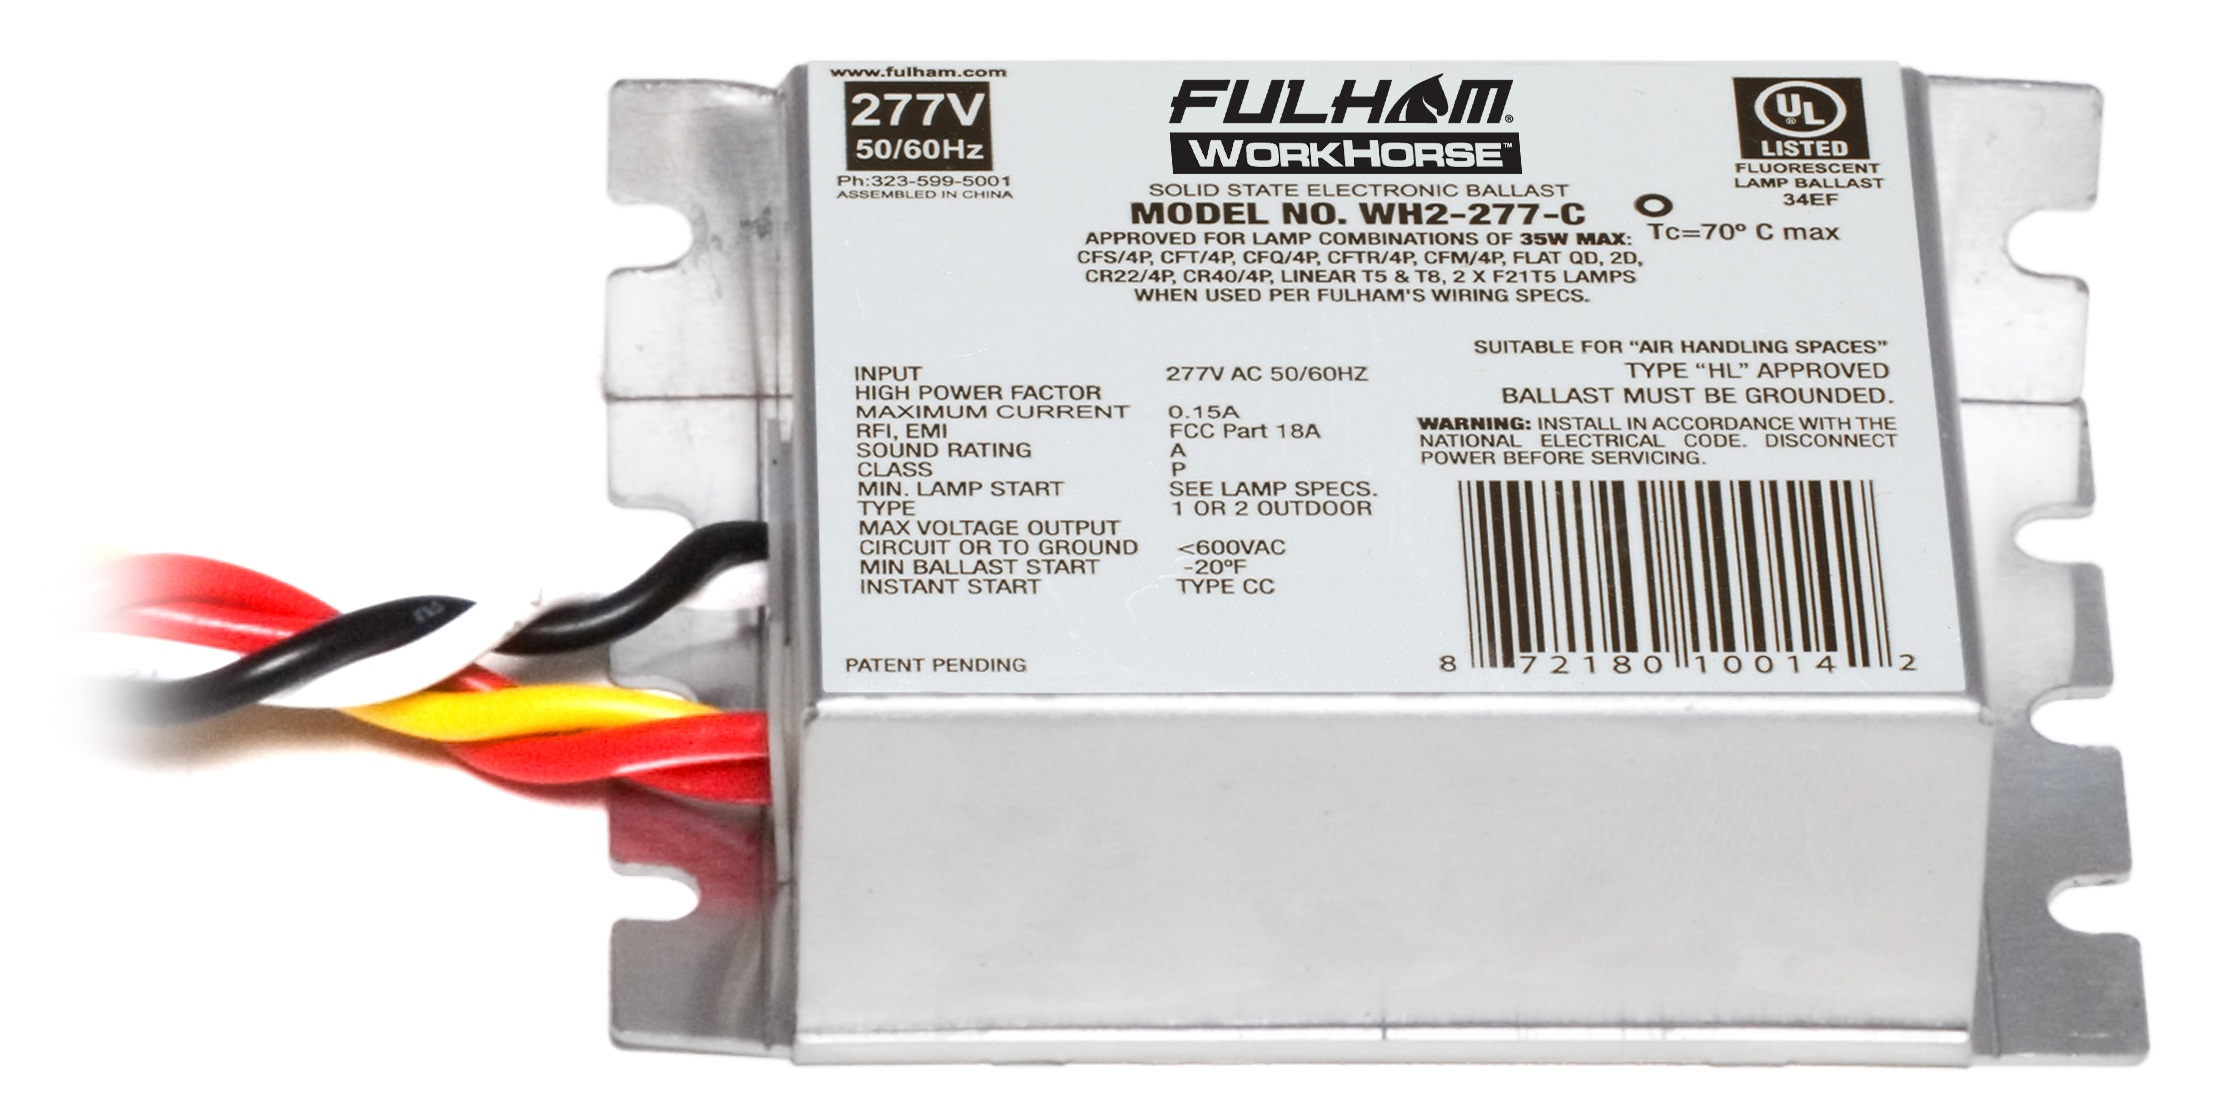 fulham workhorse 6 electronic ballast wiring diagram efcaviation com